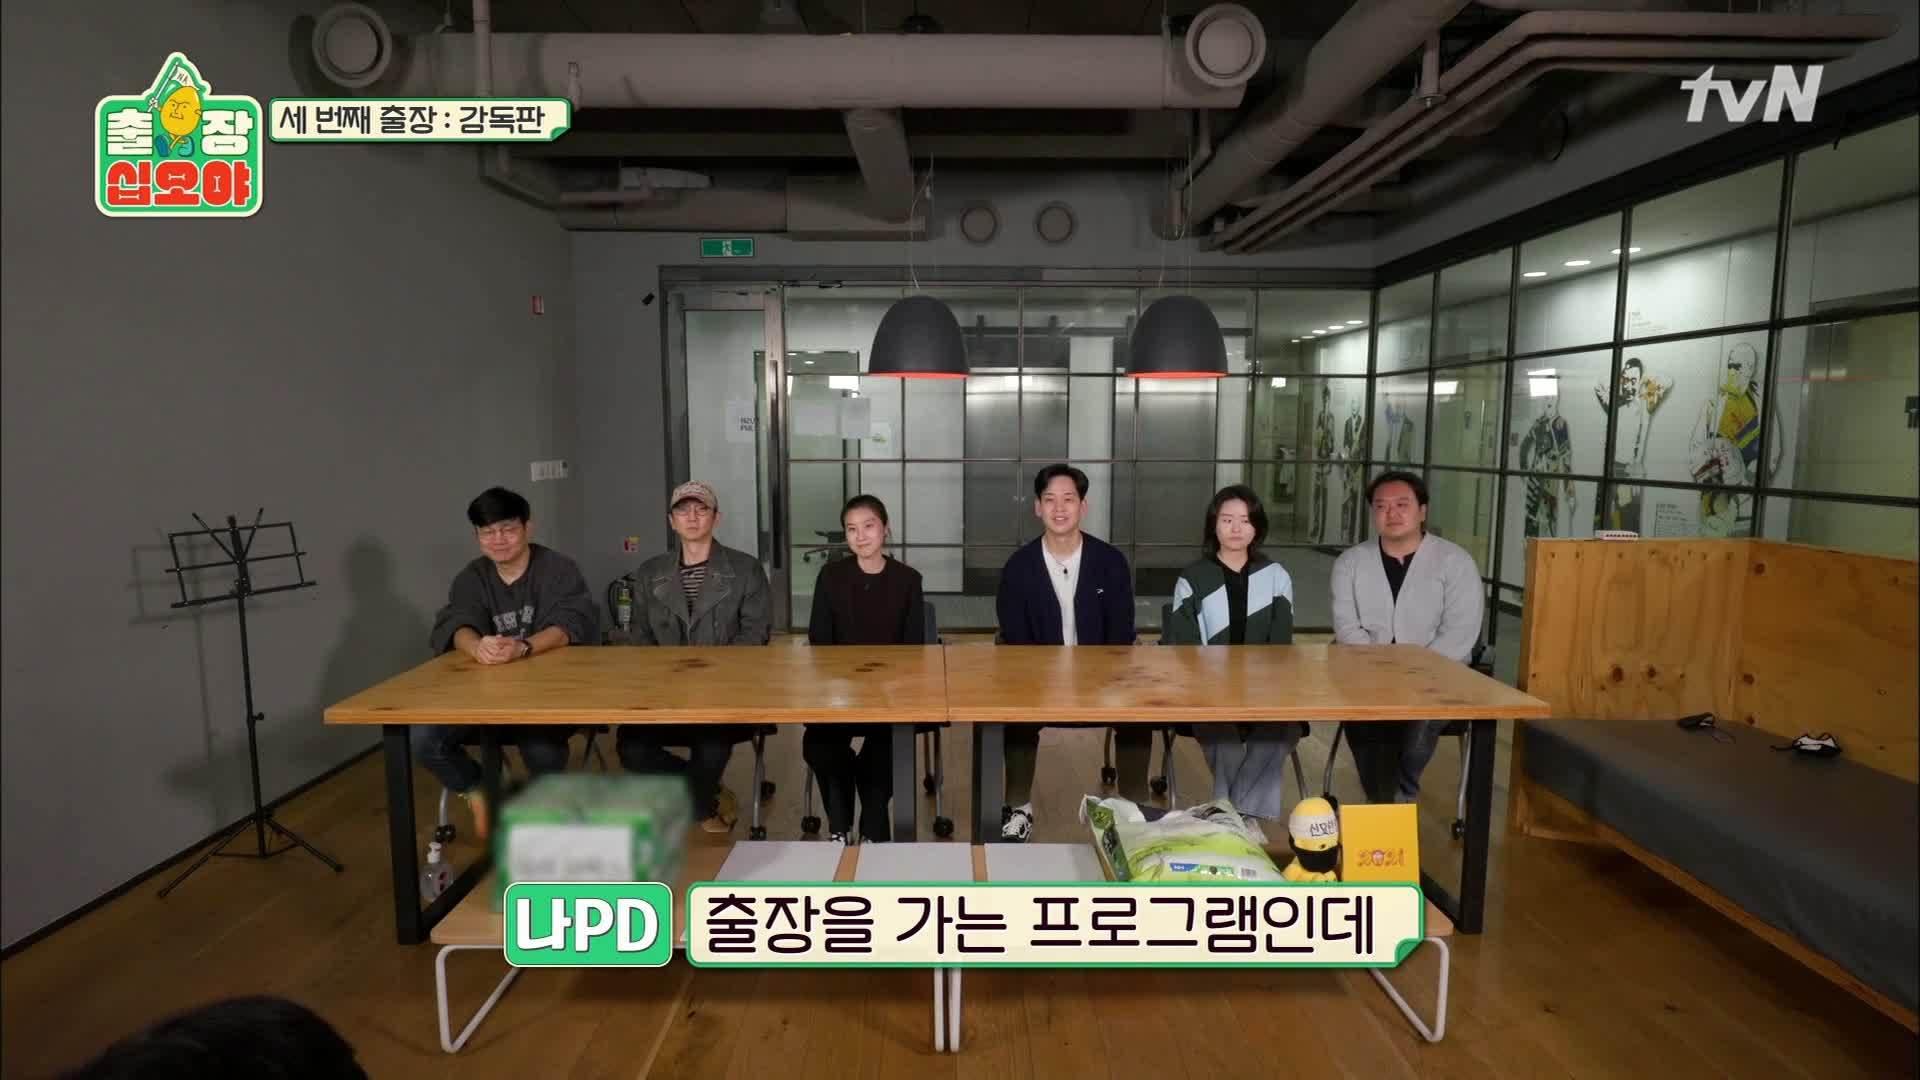 tvN 대표(?) 나피디가 방송국 놈들 소집한 이유.mp4   tvN 210416 방송